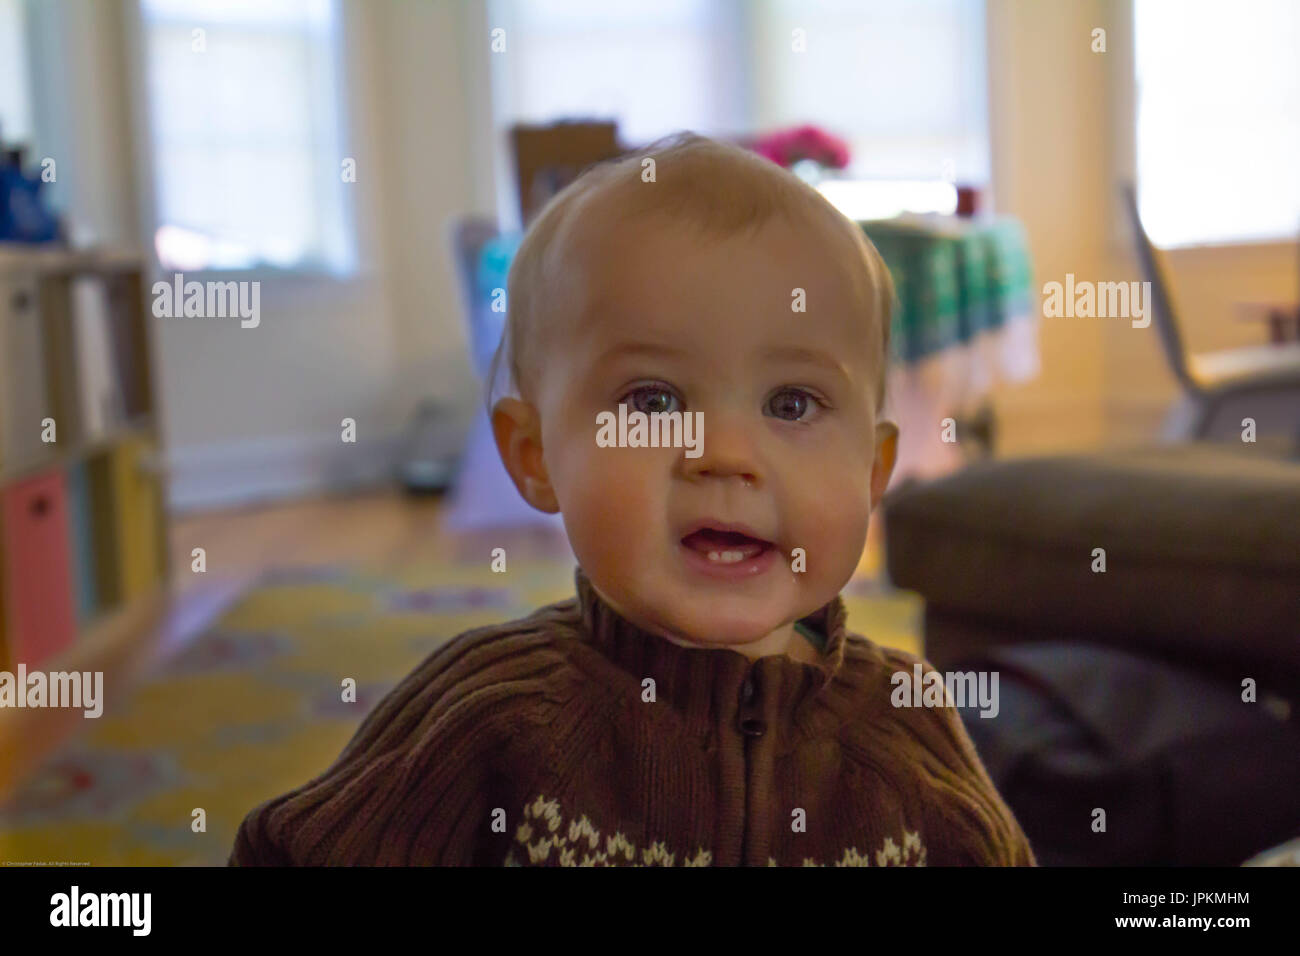 Goofy Baby - Stock Image